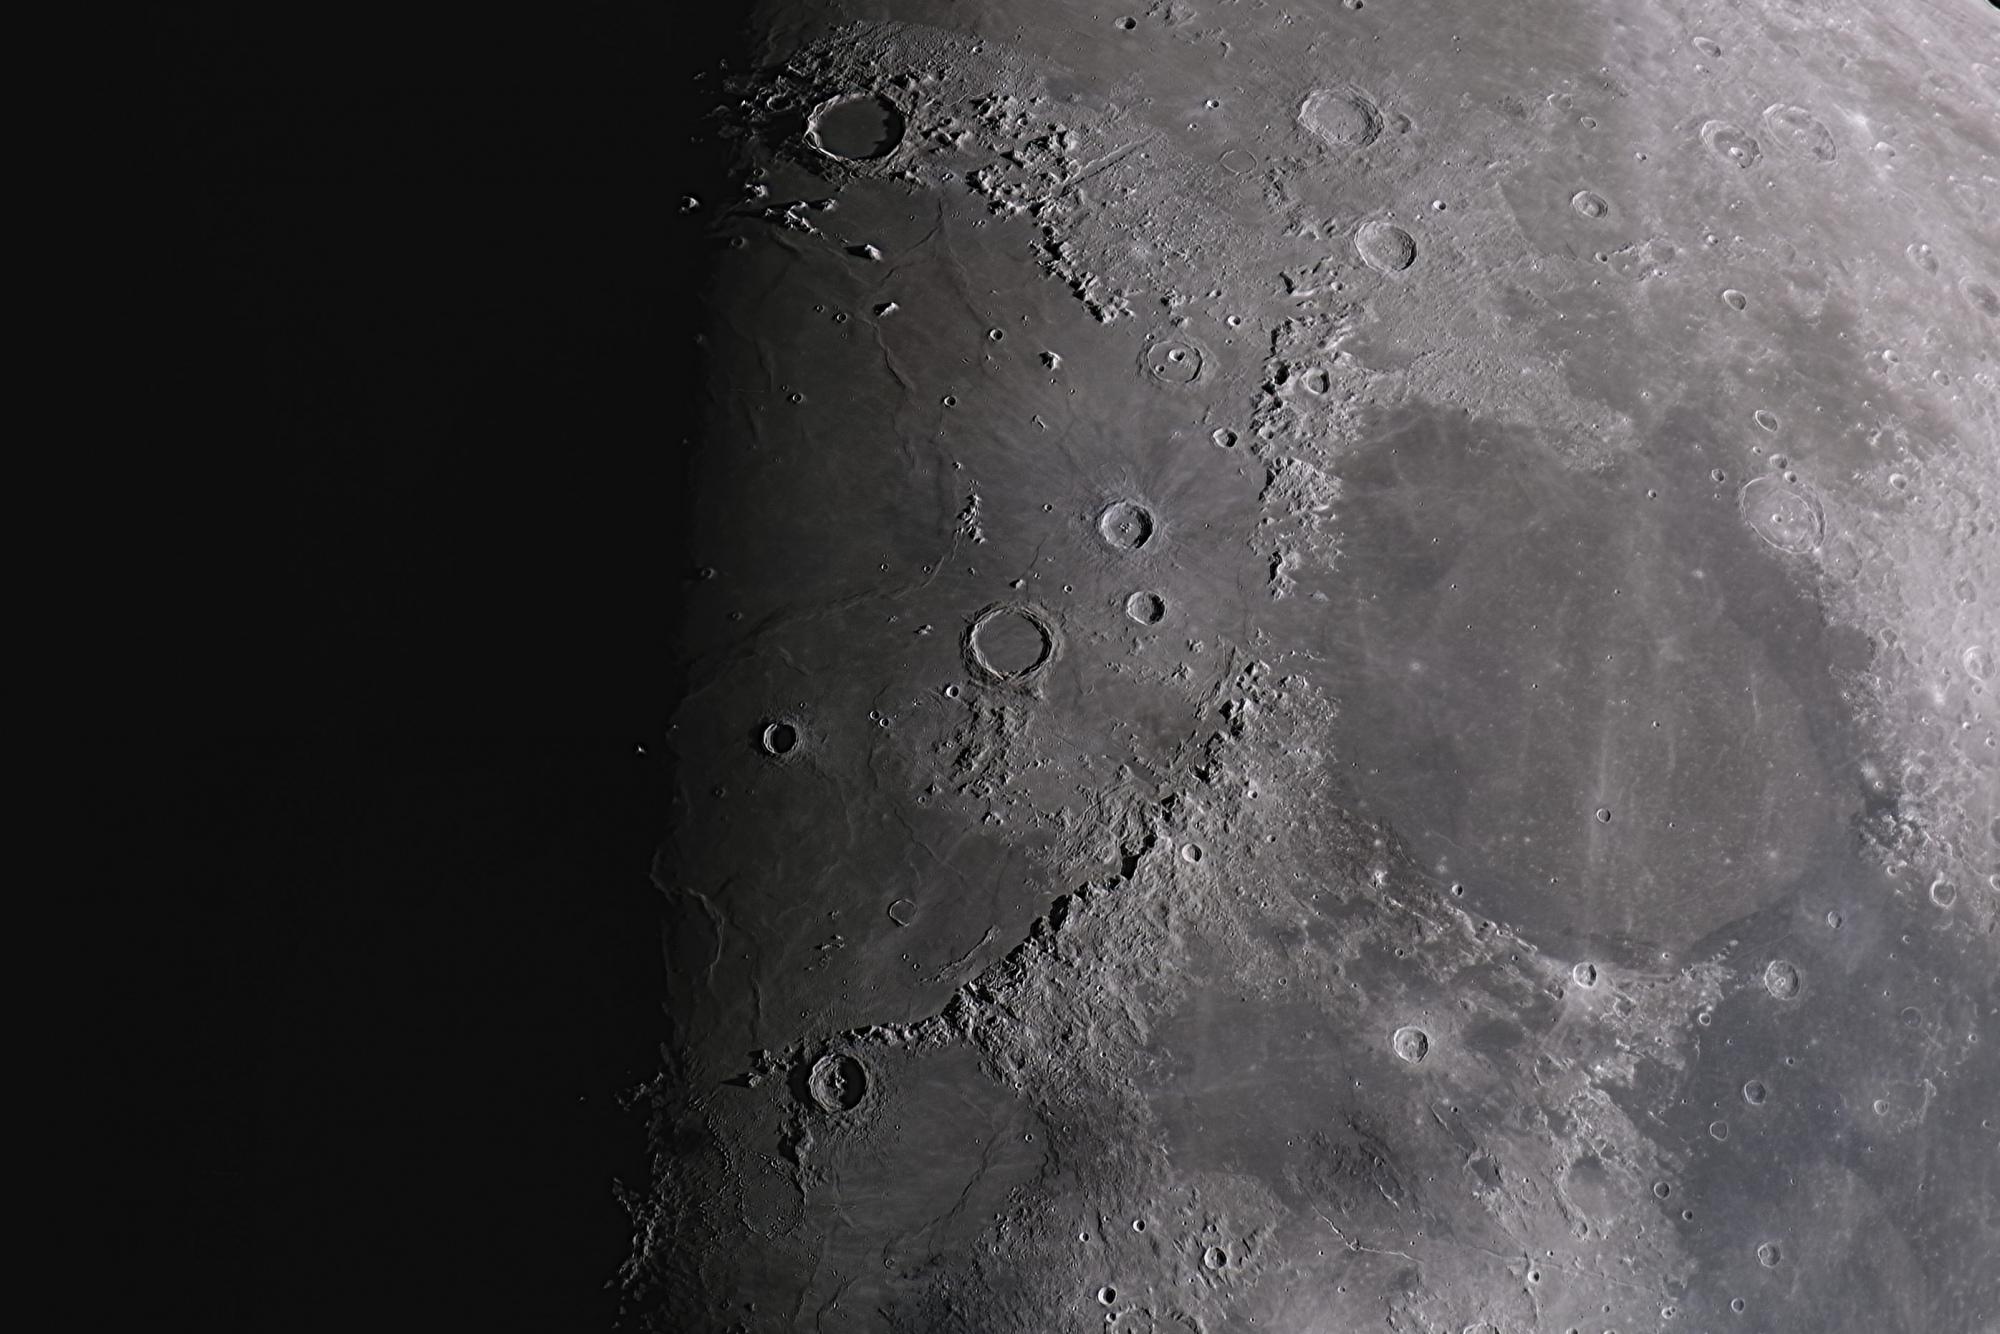 DSCF1536_pipp_lapl3_ap5842-Astrosurface-PS-2.jpg